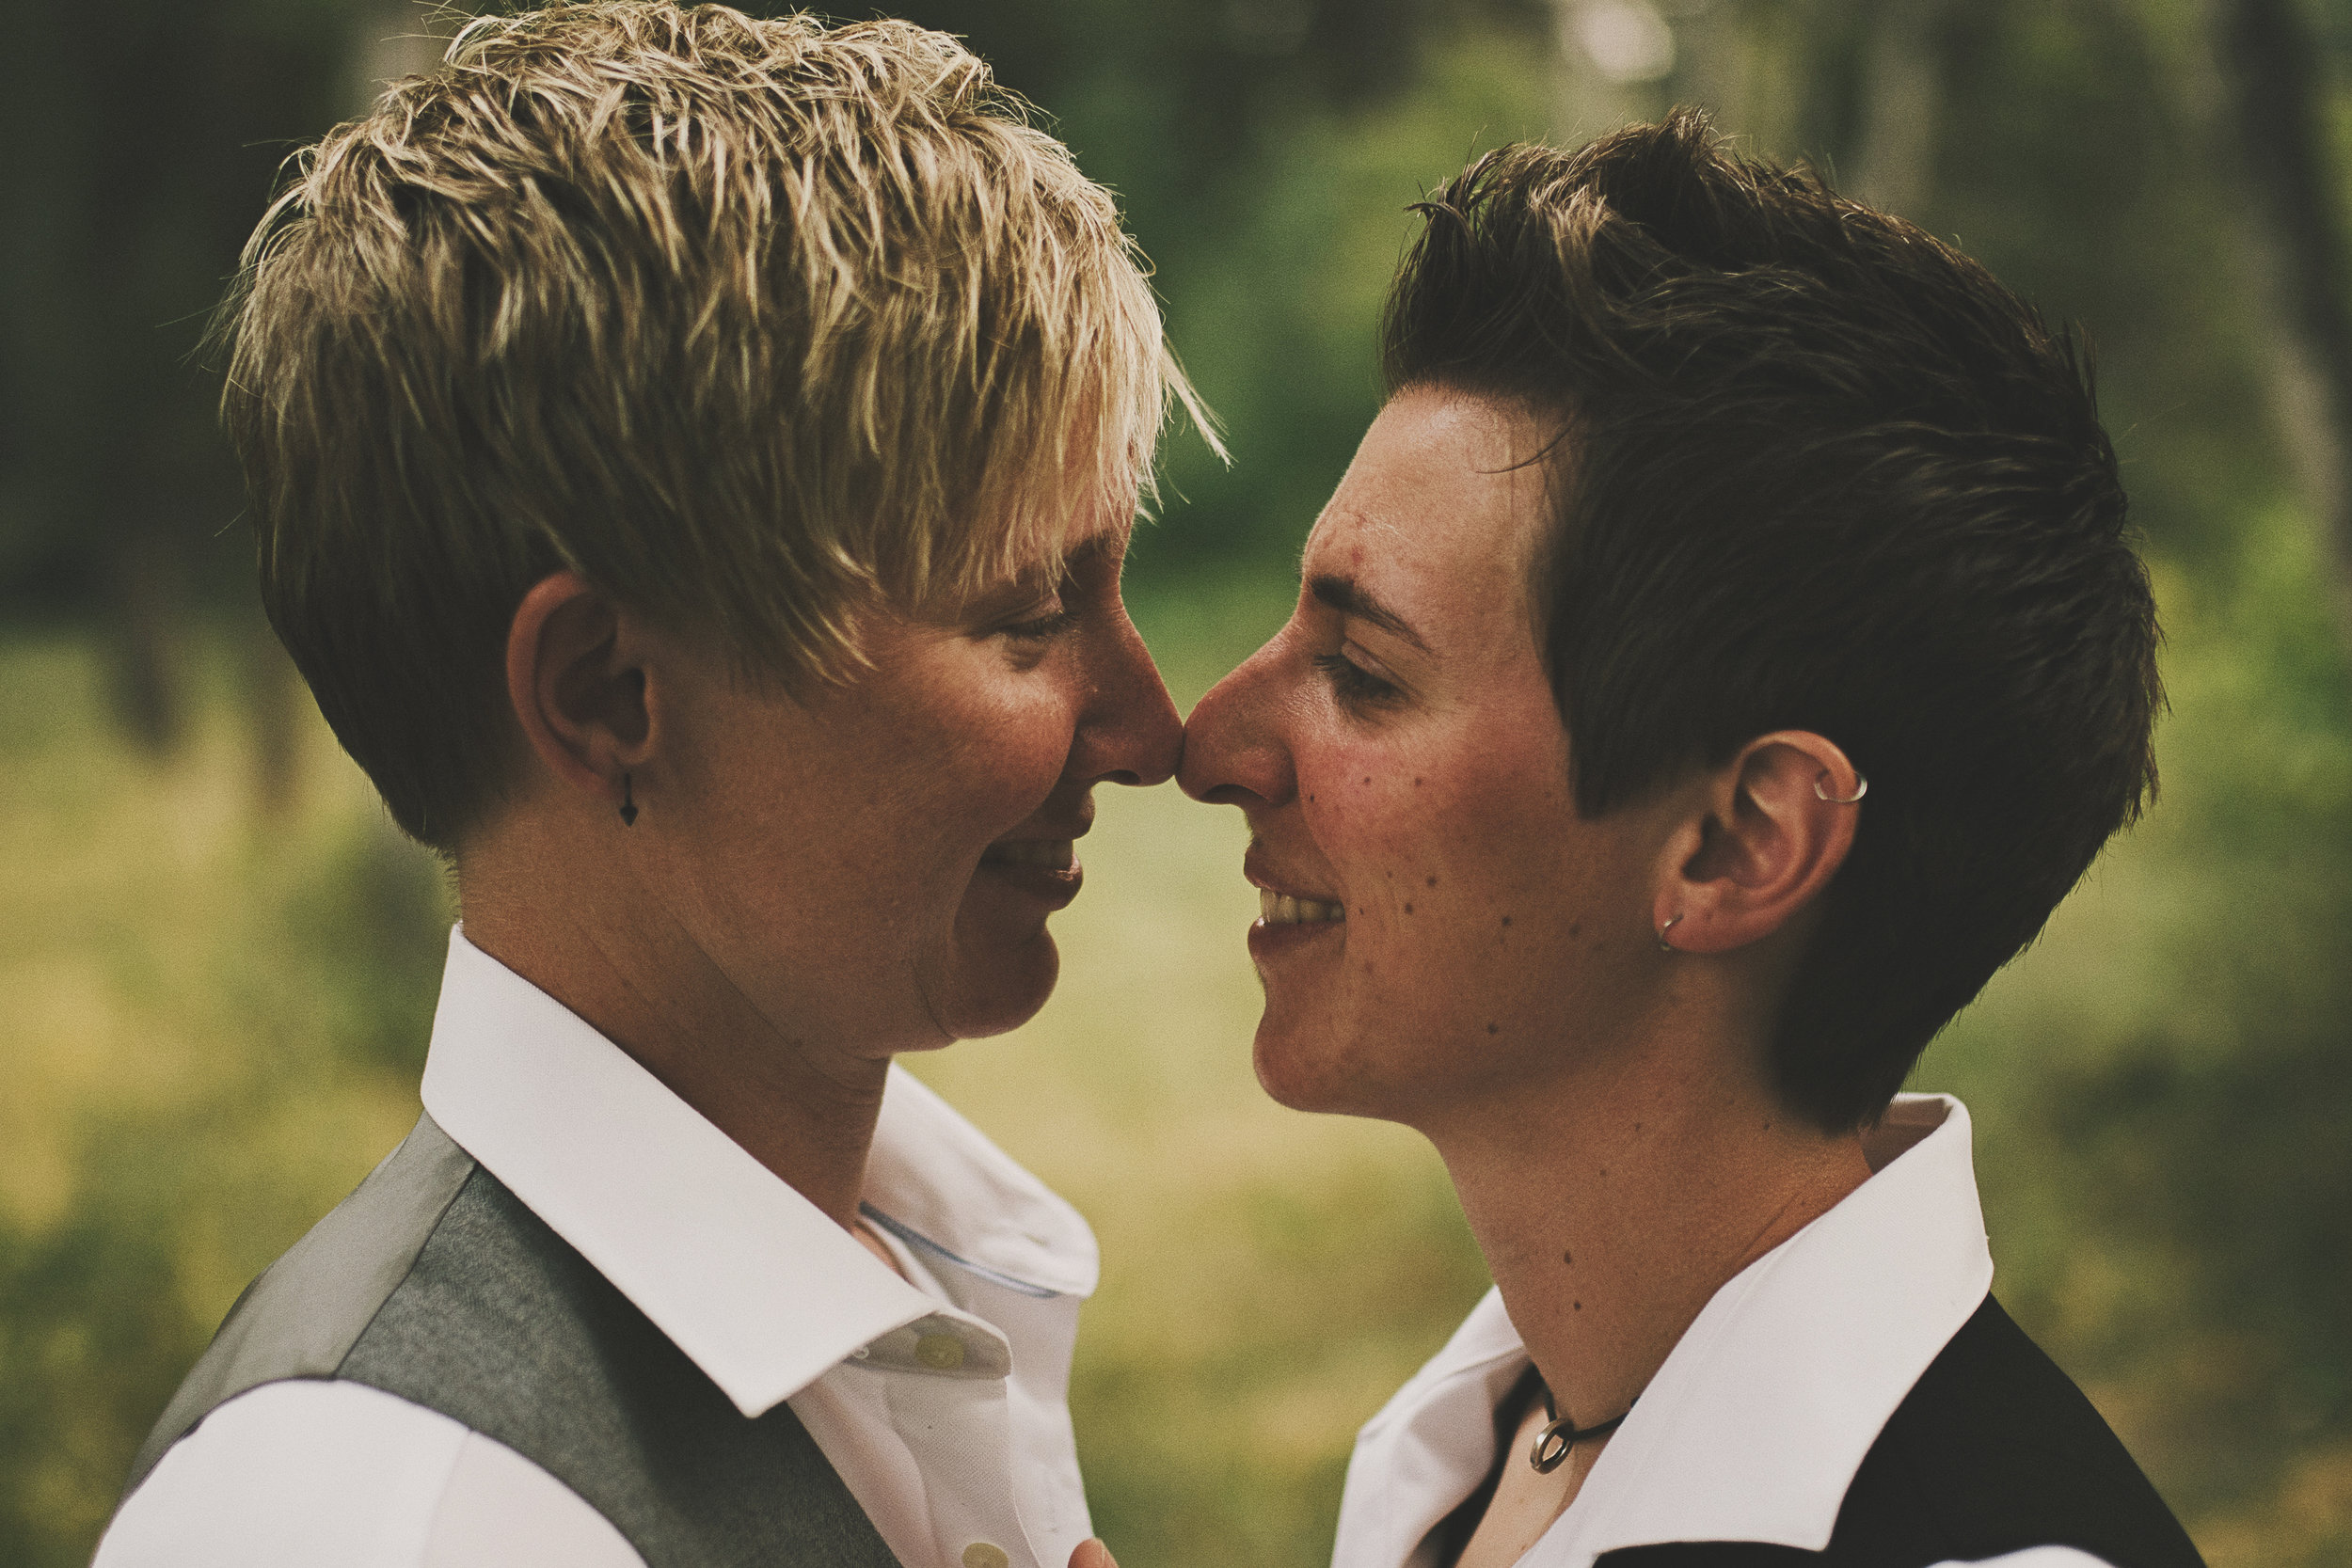 Glacier Montana Wedding_Elly Maurer + Frankie Dashiell Wedding_Beautiful Outdoor Wedding_Kelsey Lane Photography-5282 copy.jpg